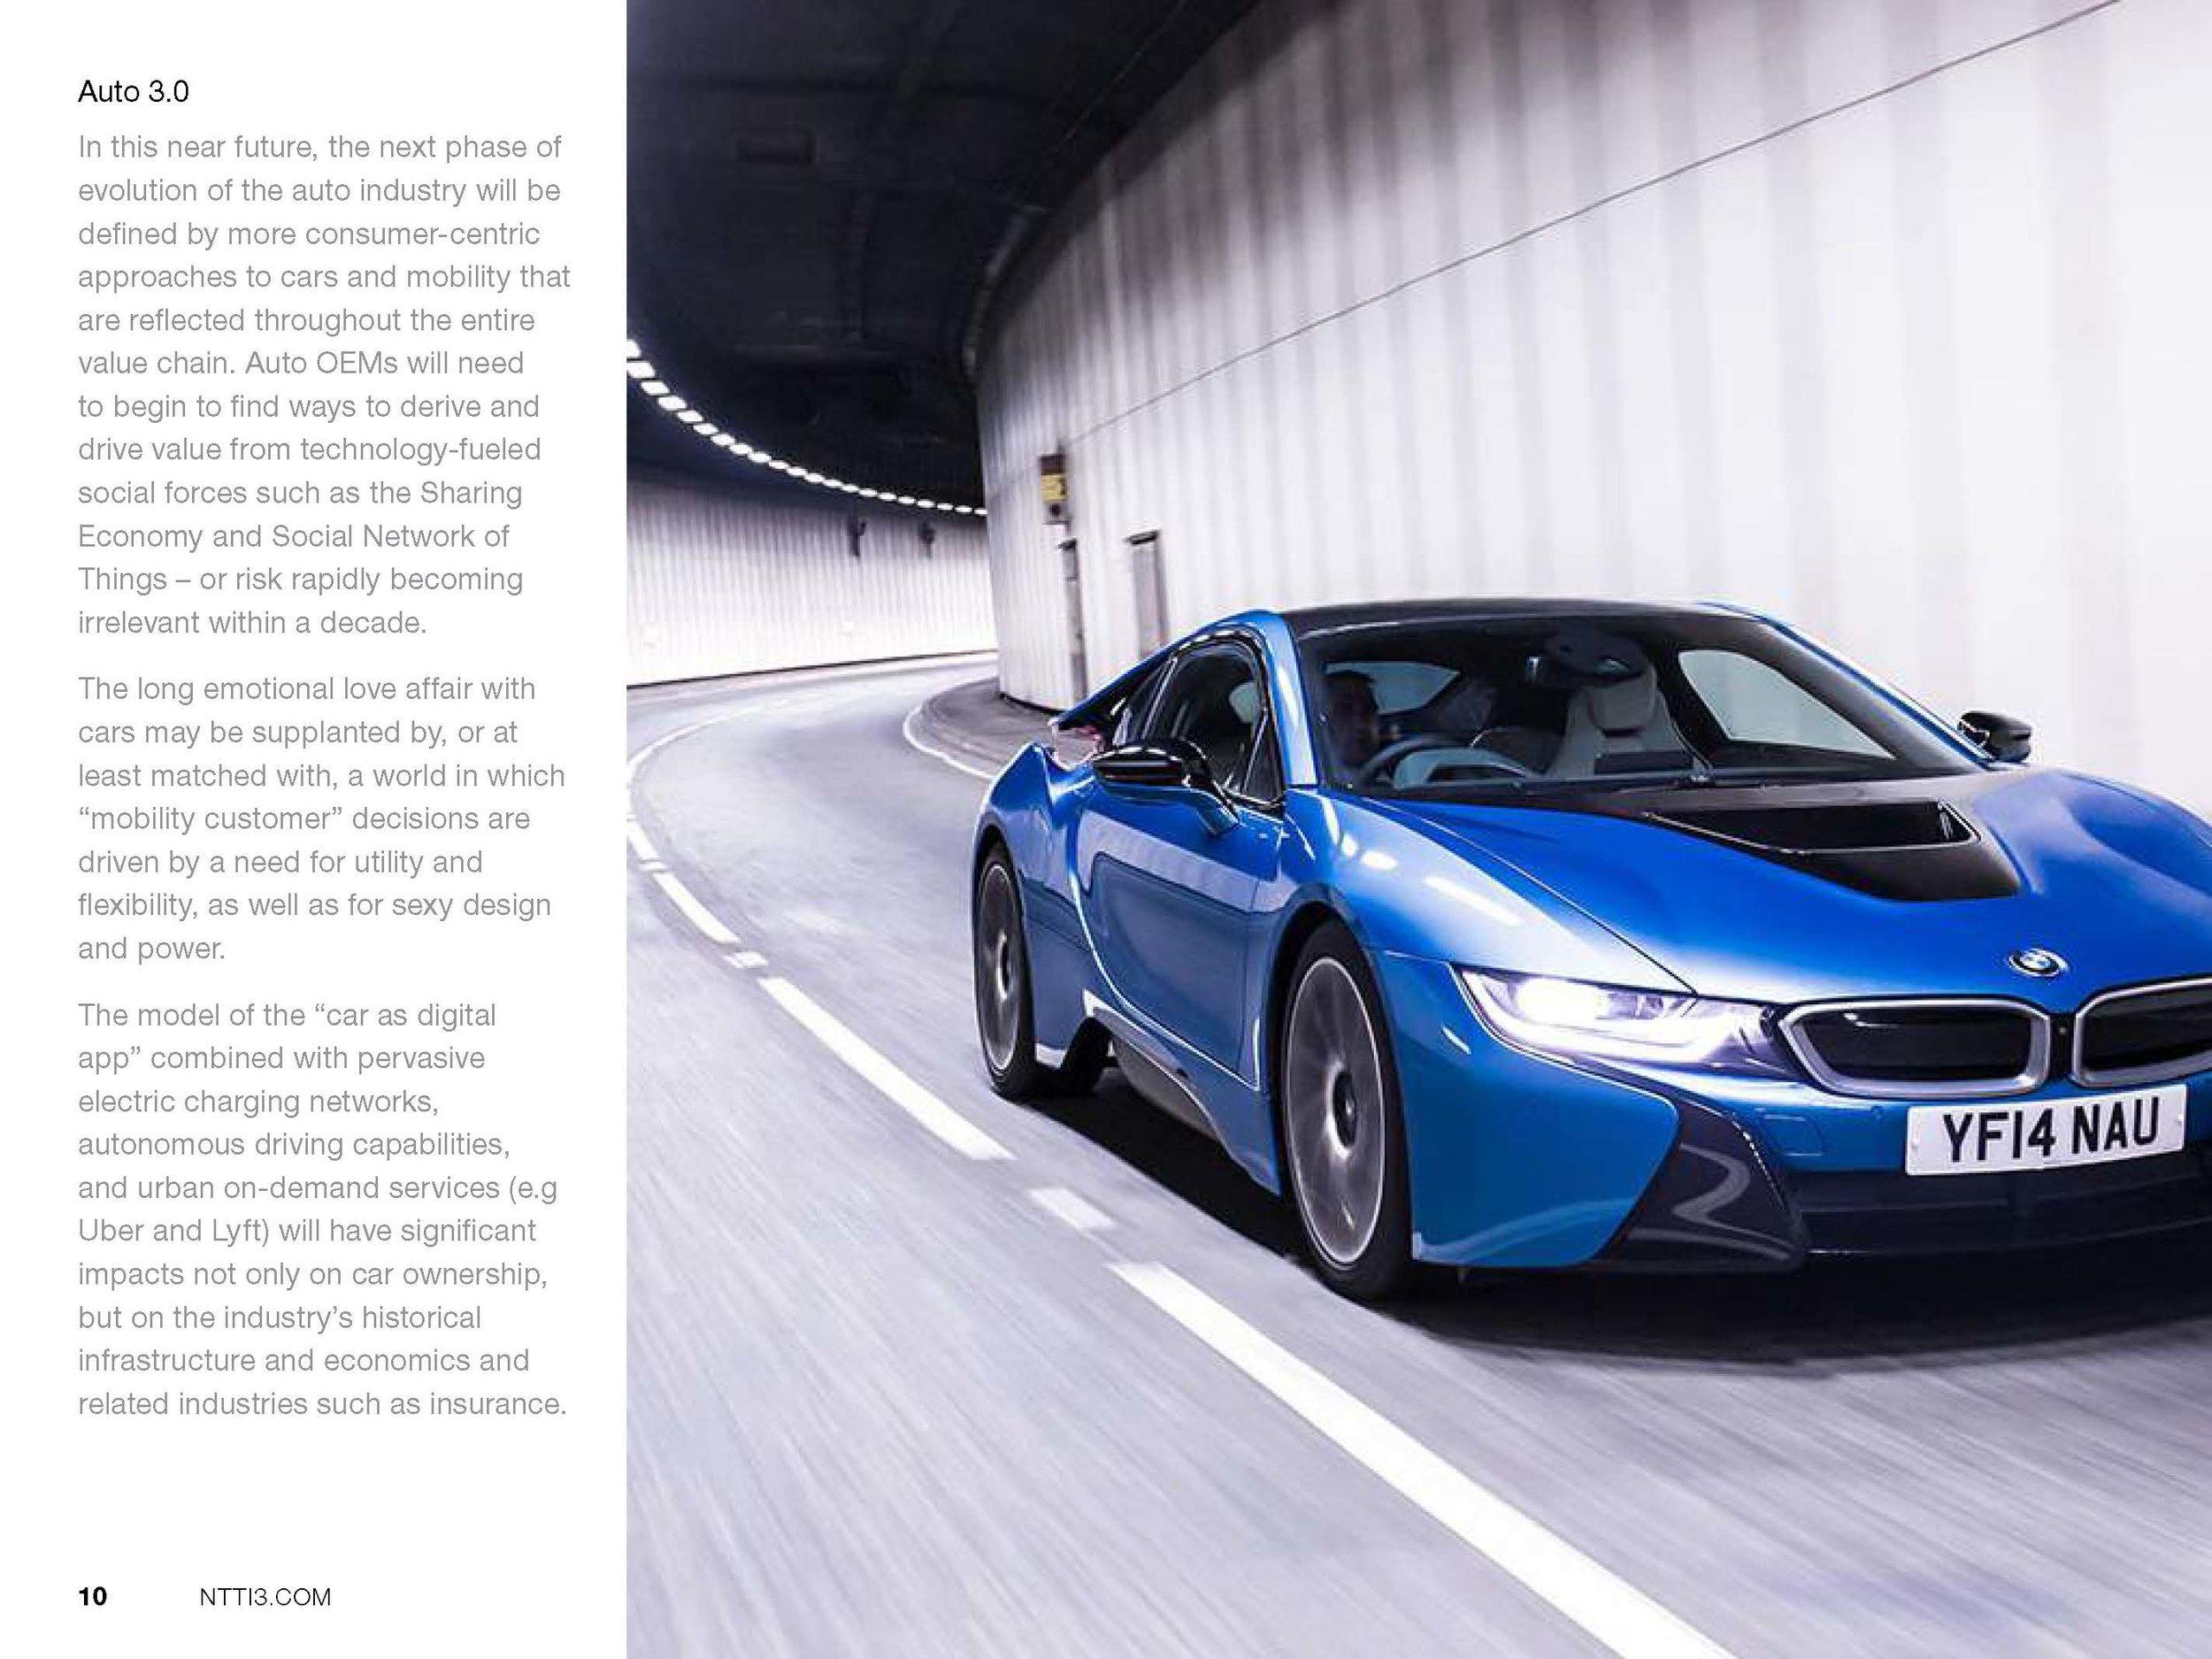 automotive_Page_10.jpg